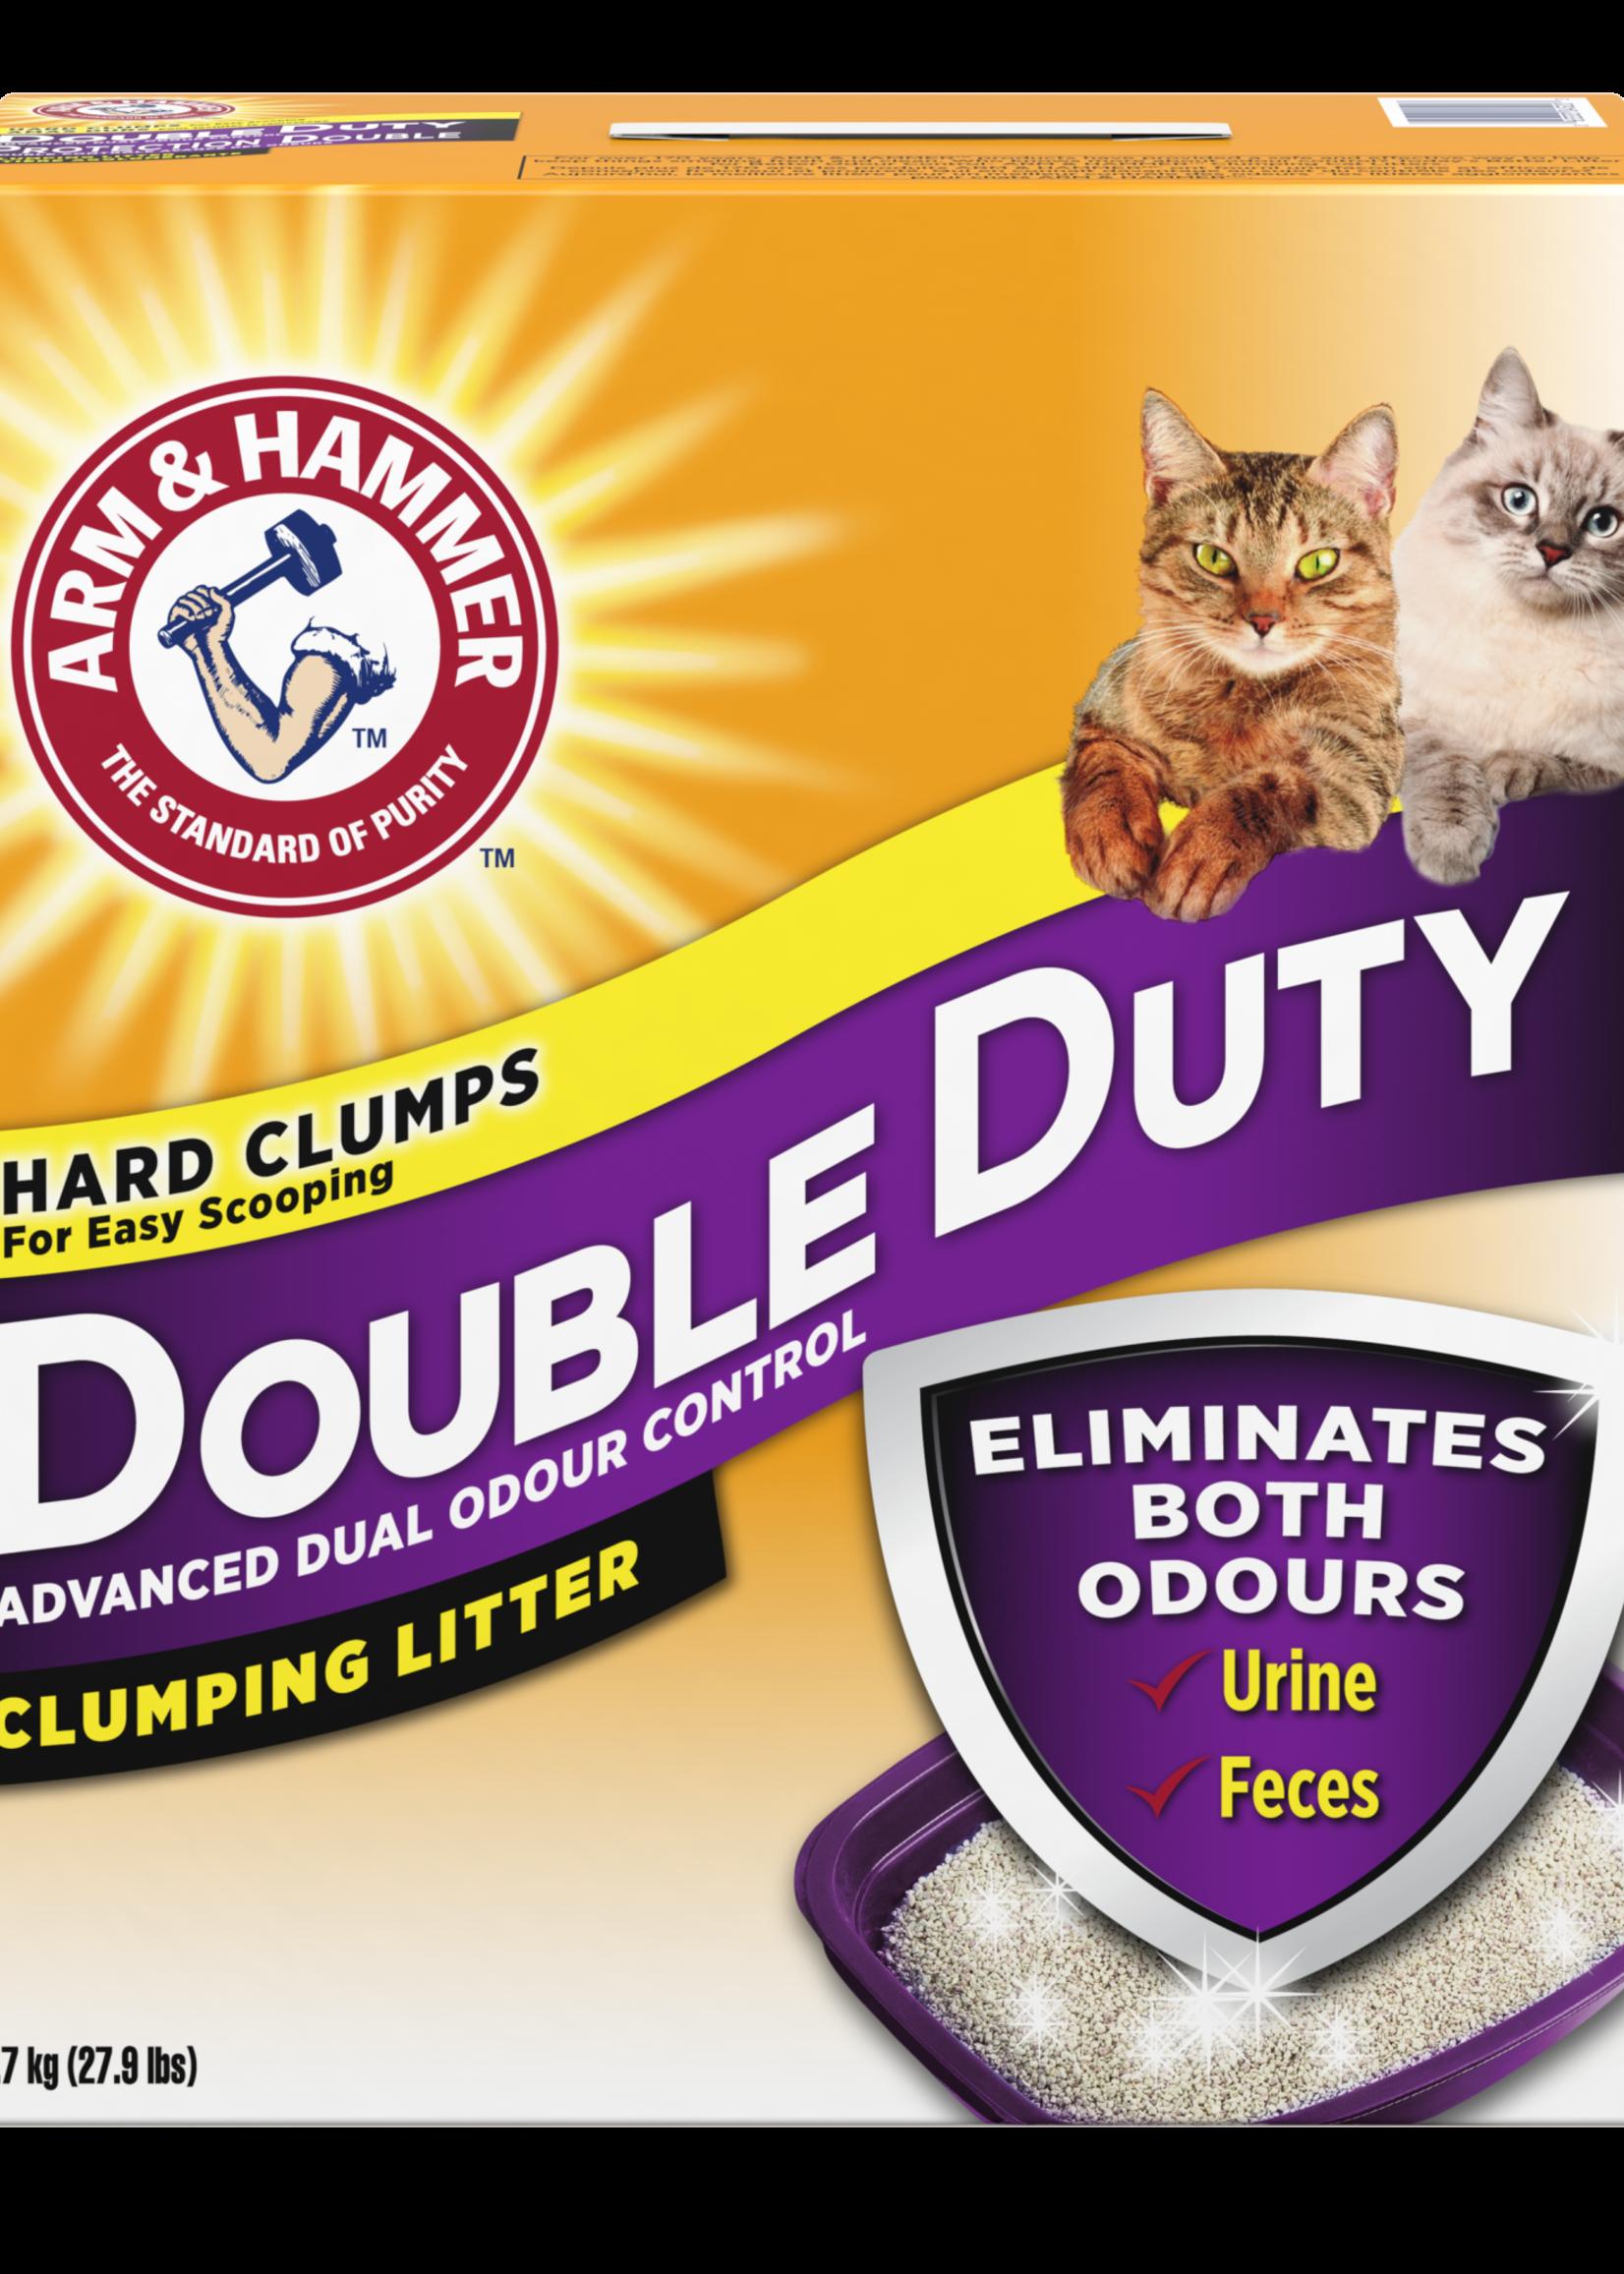 Arm & Hammer™ Arm & Hammer Double Duty Clumping Litter 28lbs